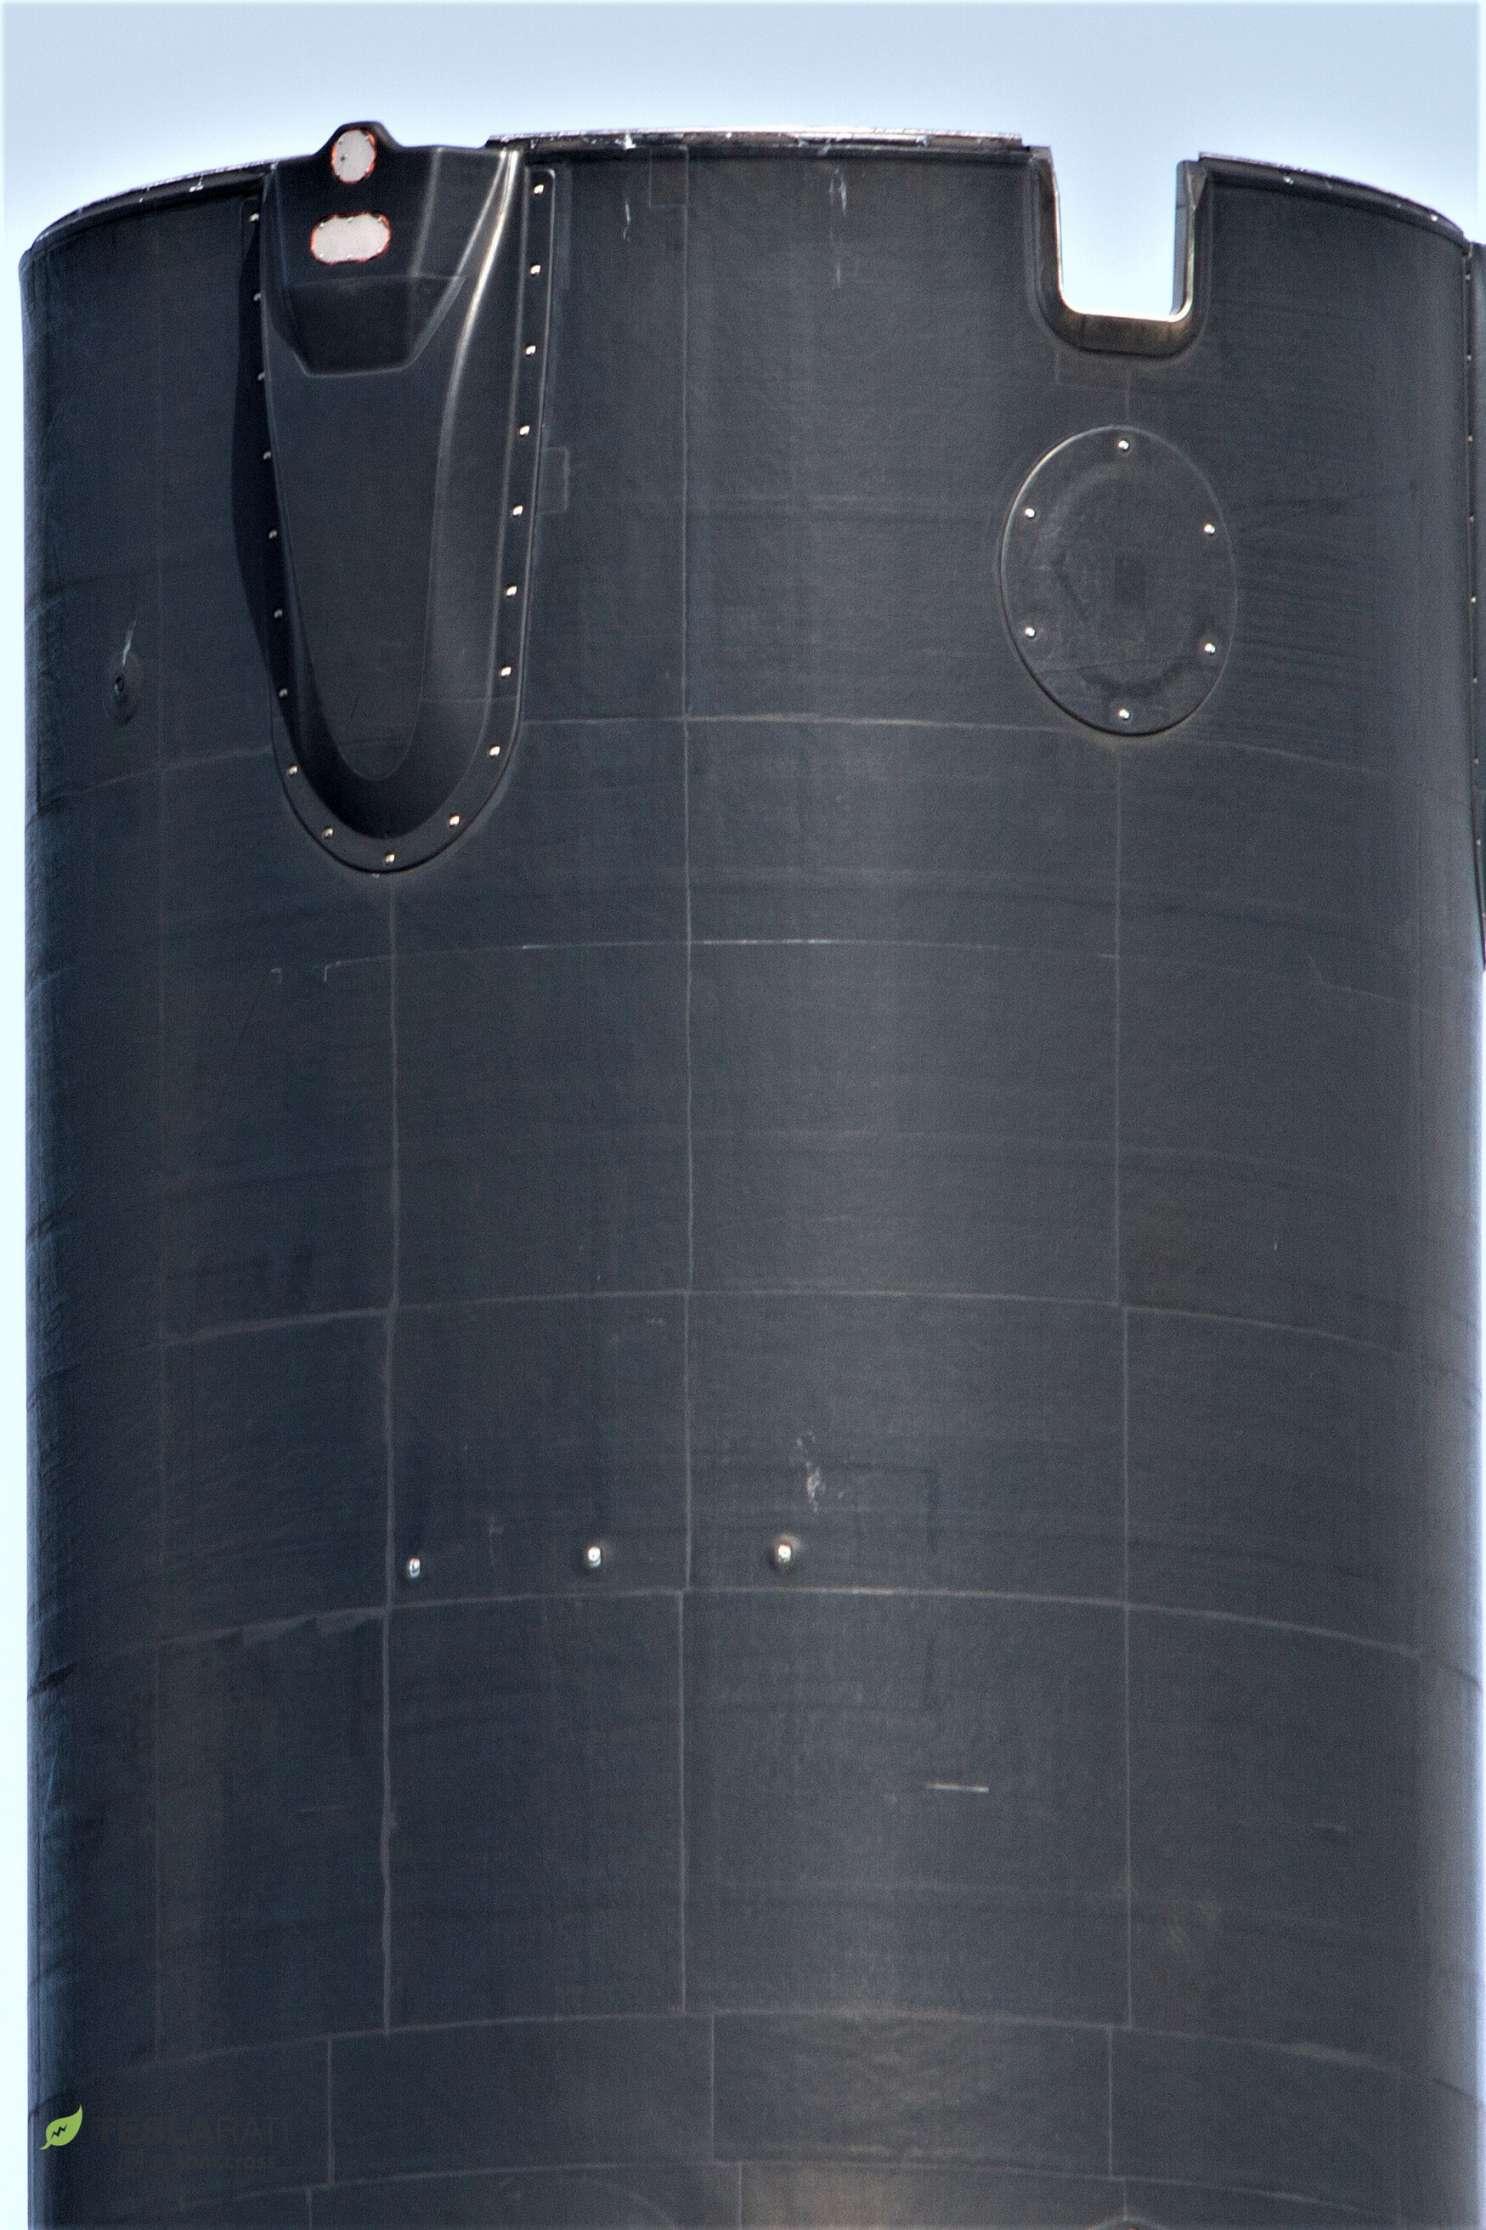 Falcon 9 B1049 OCISLY return detail 091218 (Tom Cross) 9(c)